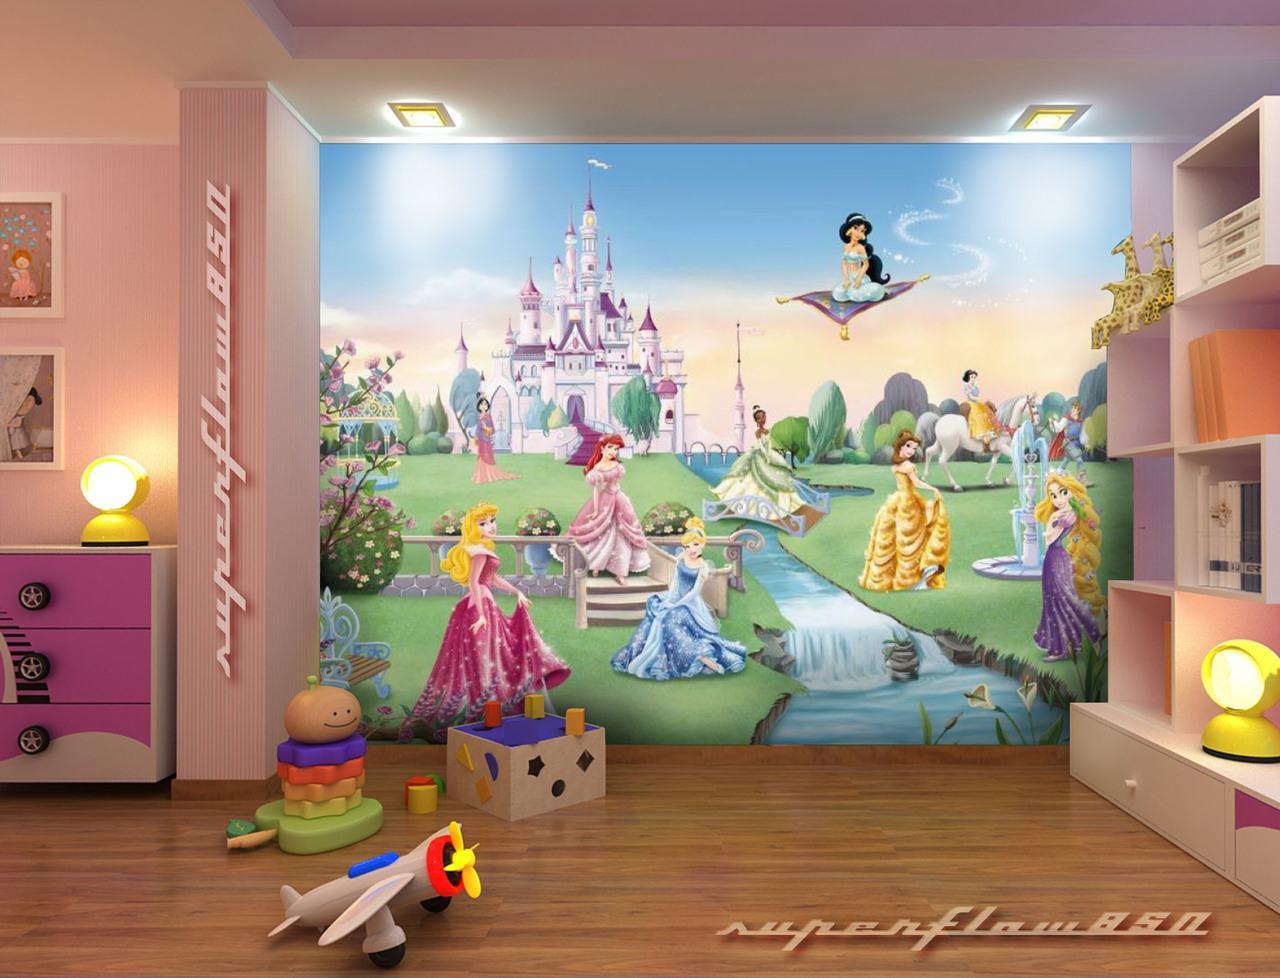 Wallpapers Backgrounds   Princess Castle Disney Wallpaper Mural KIDS 1280x978